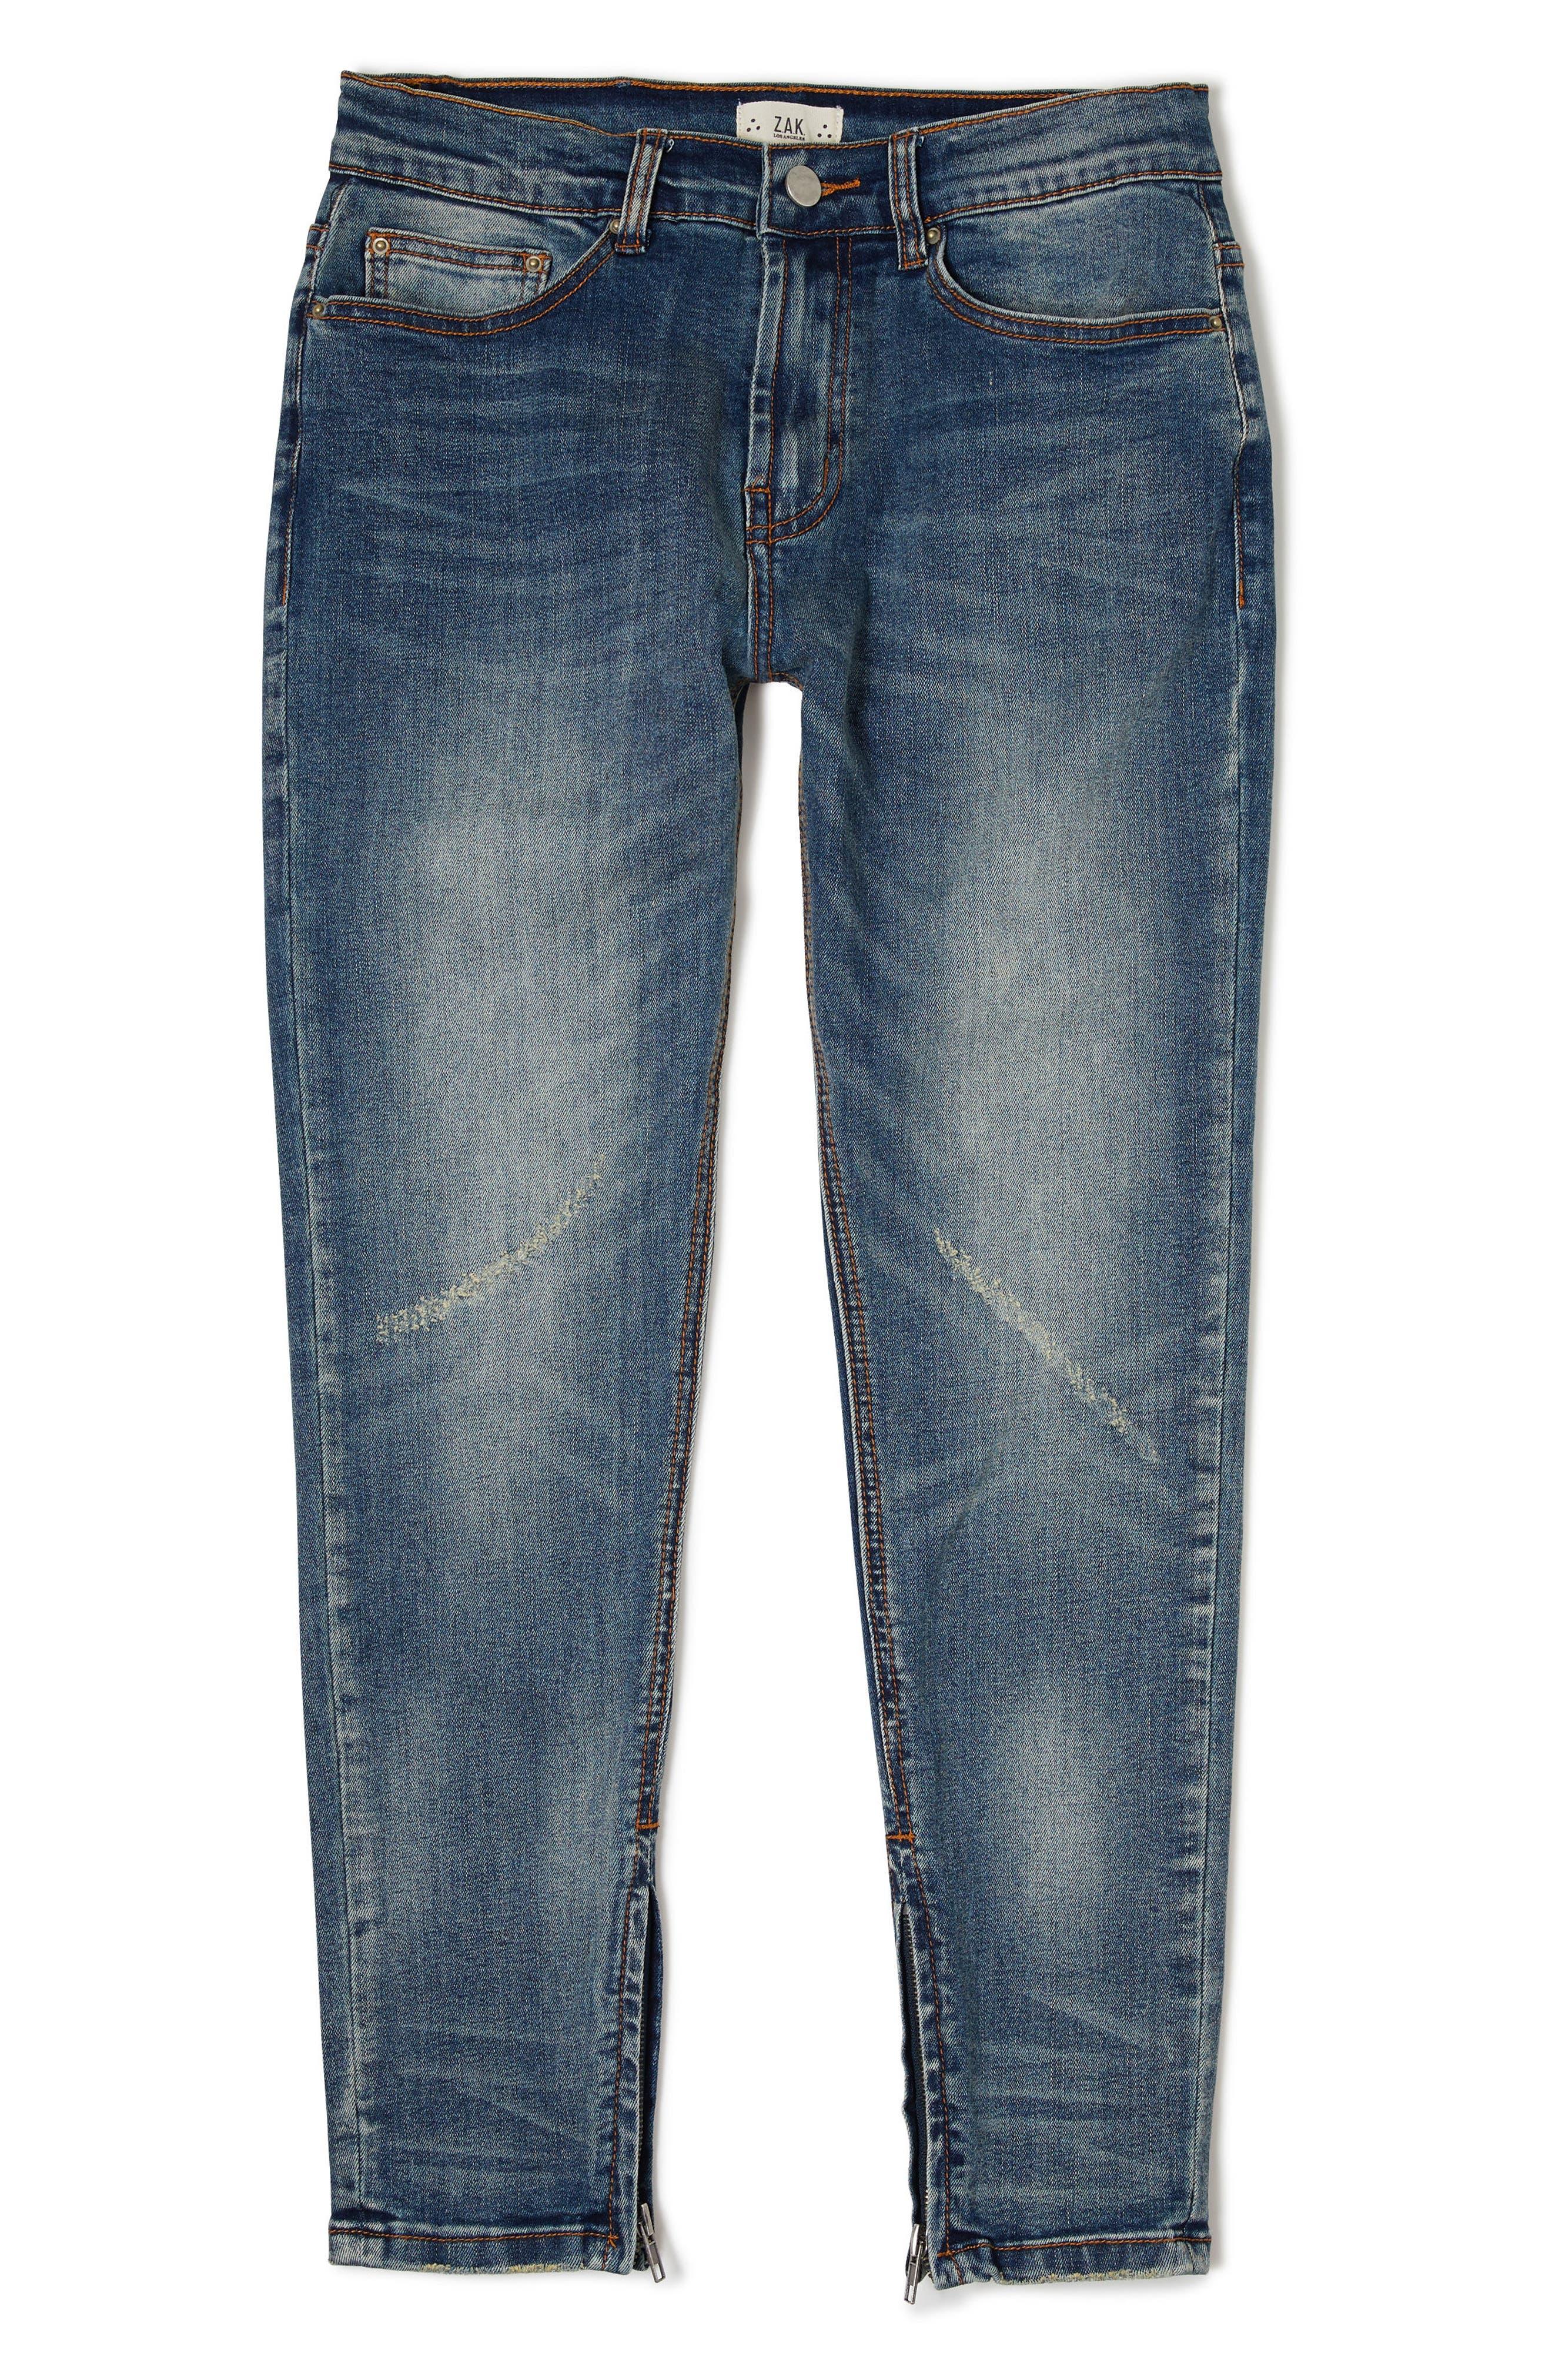 Sand Blasted Moto Skinny Jeans Big Boys),                         Main,                         color, Dark Wash Denim